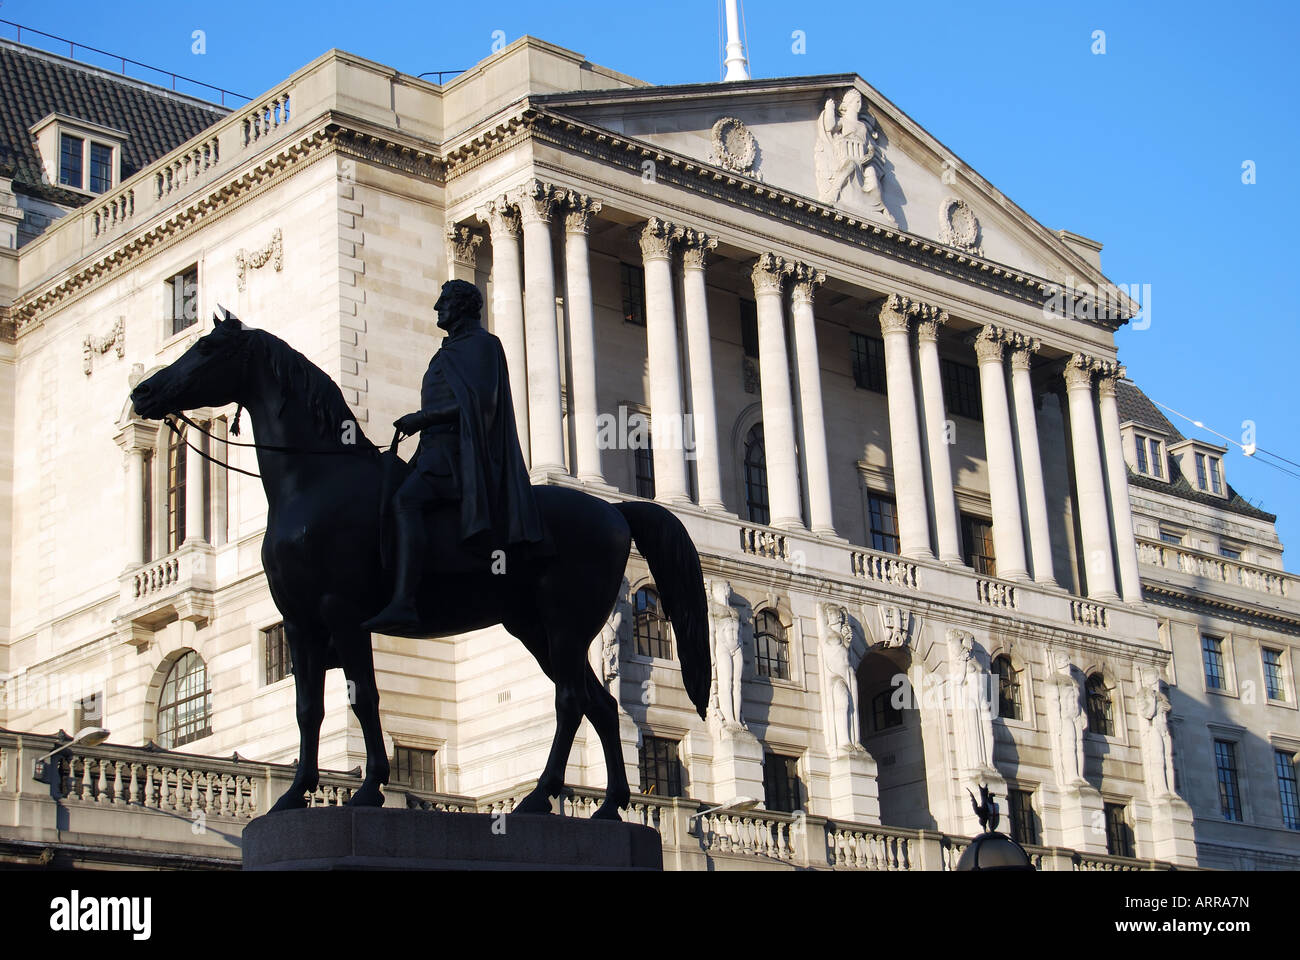 Bank of England, Threadneedle Street, City of London, London, England, United Kingdom - Stock Image